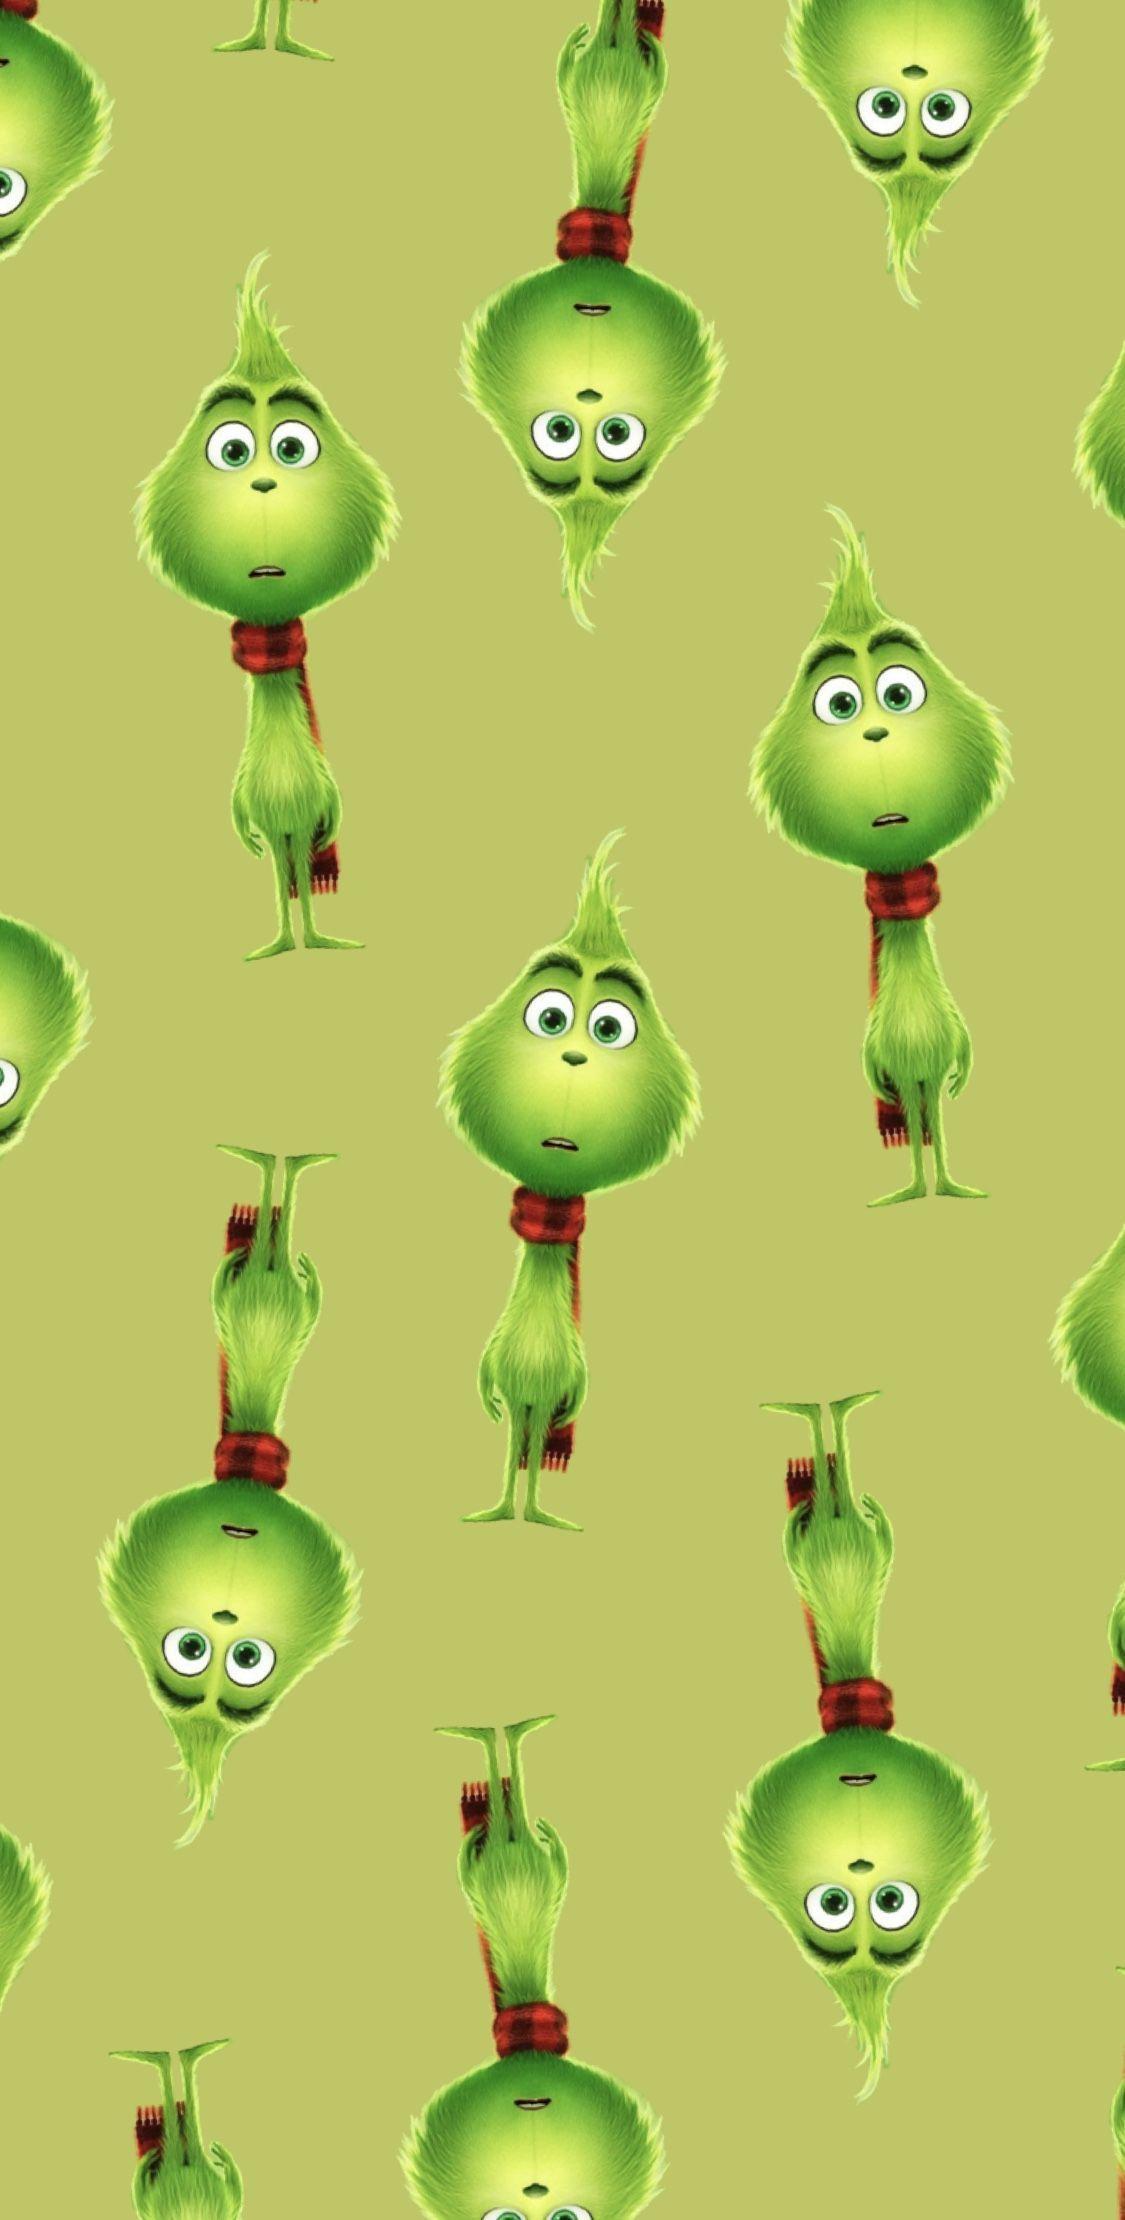 Wallpaper Grinch Grinch christmaswallpaper christmas